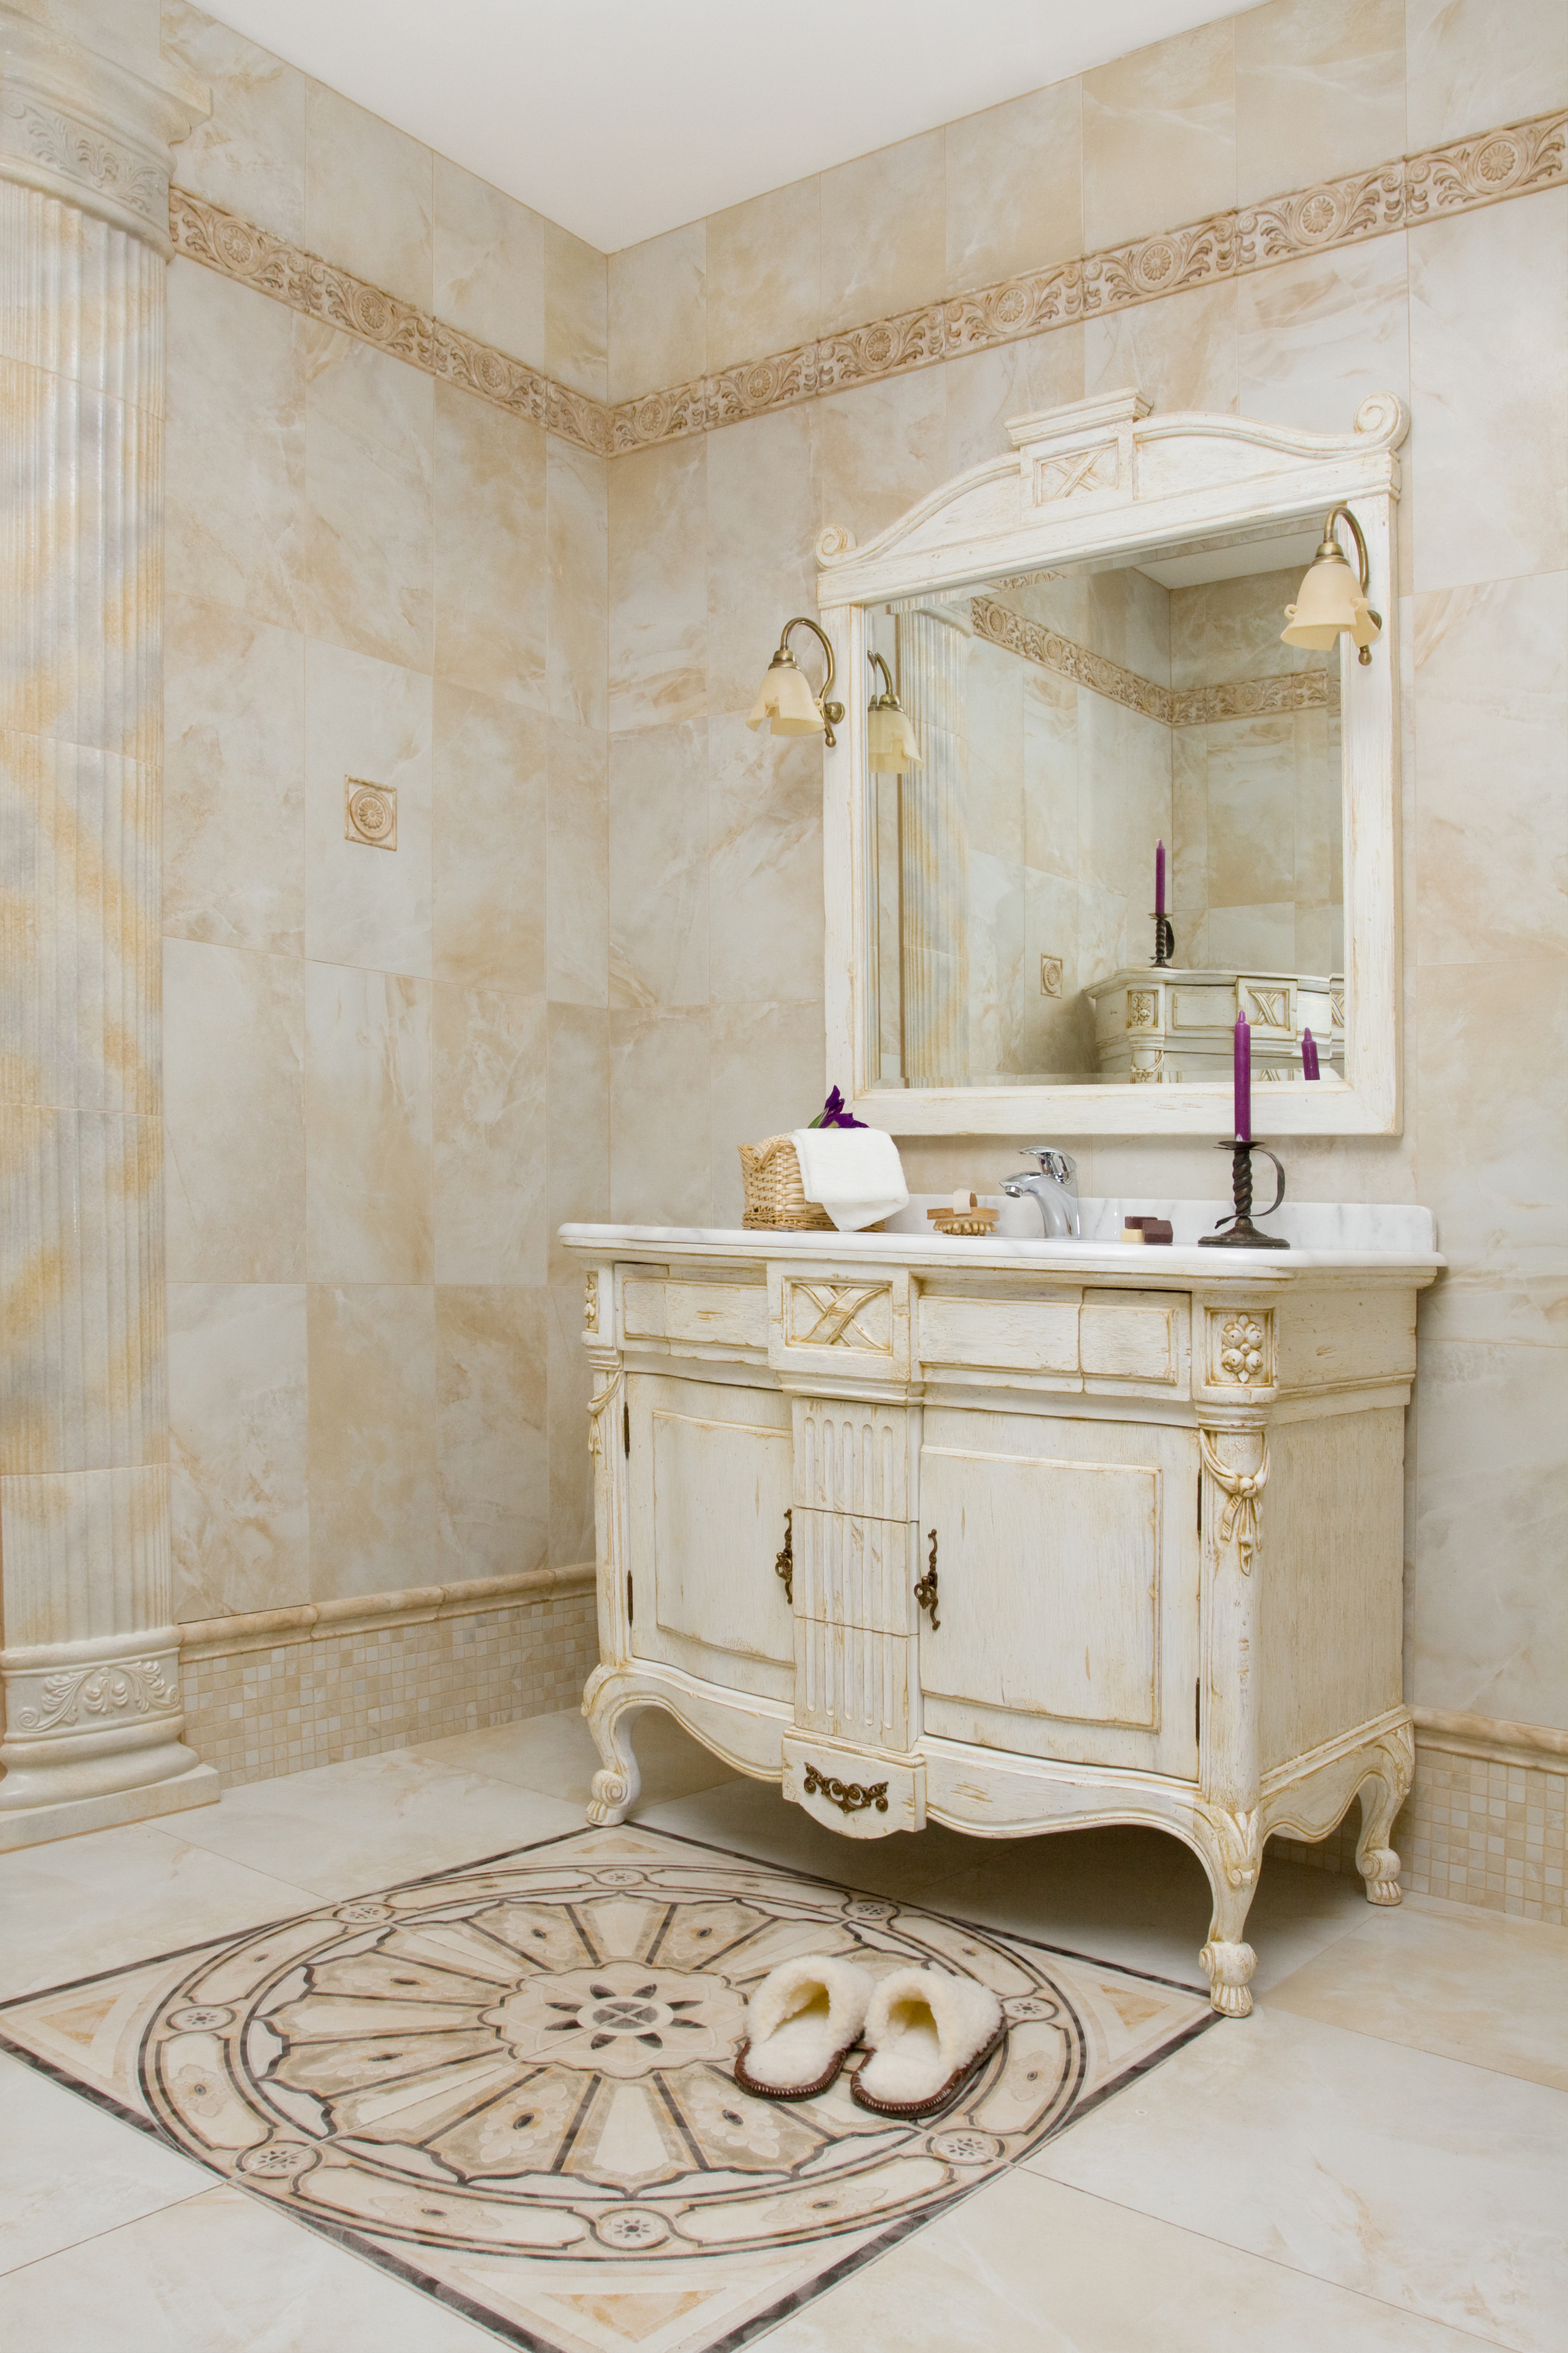 Mueble de baño estilo antiguo